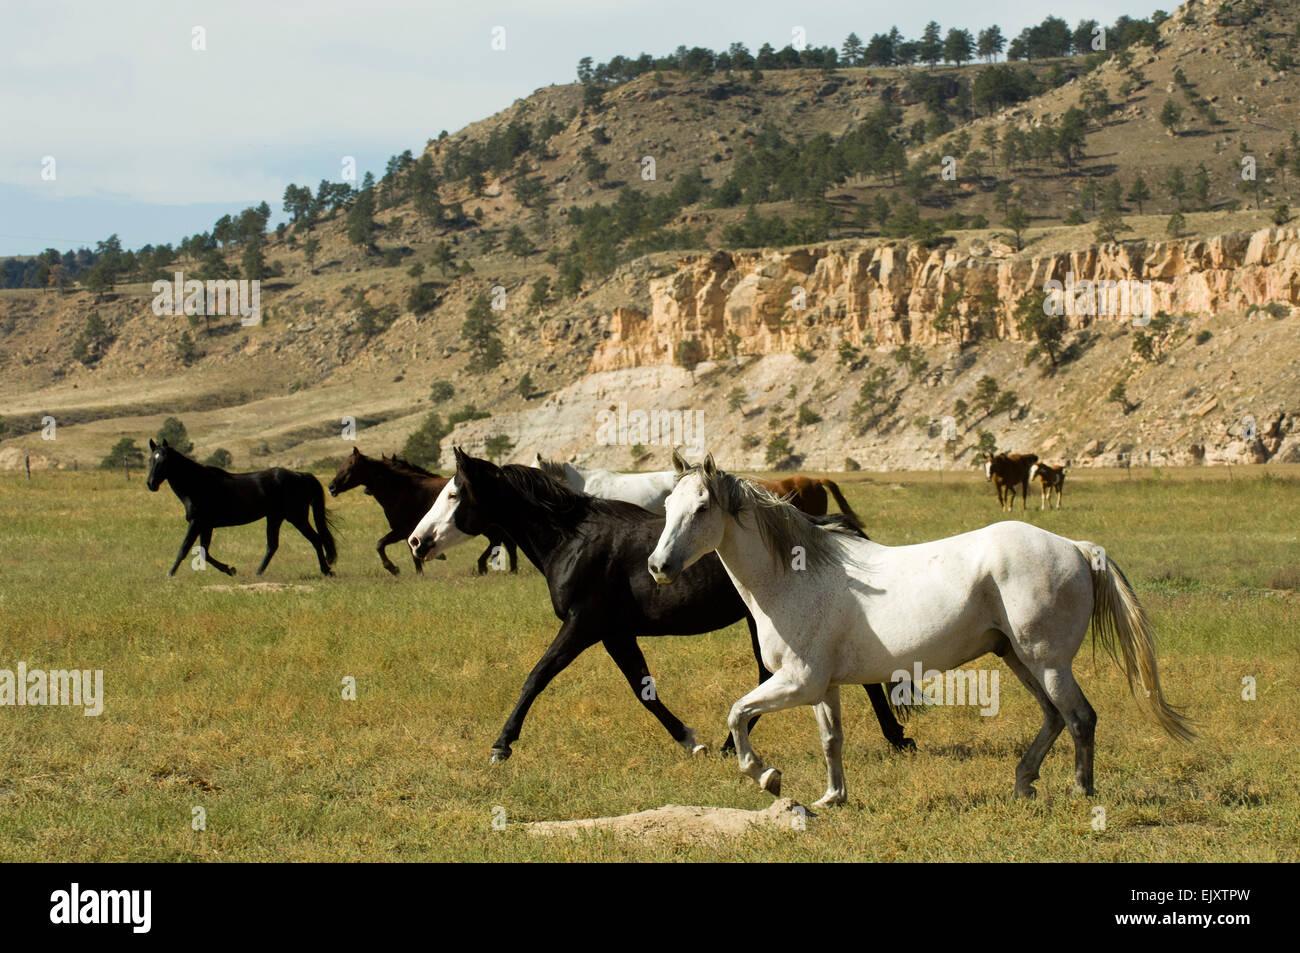 Black Hills Wild Horse Sanctuary Hot Springs South Dakota Usa Stock Photo Alamy